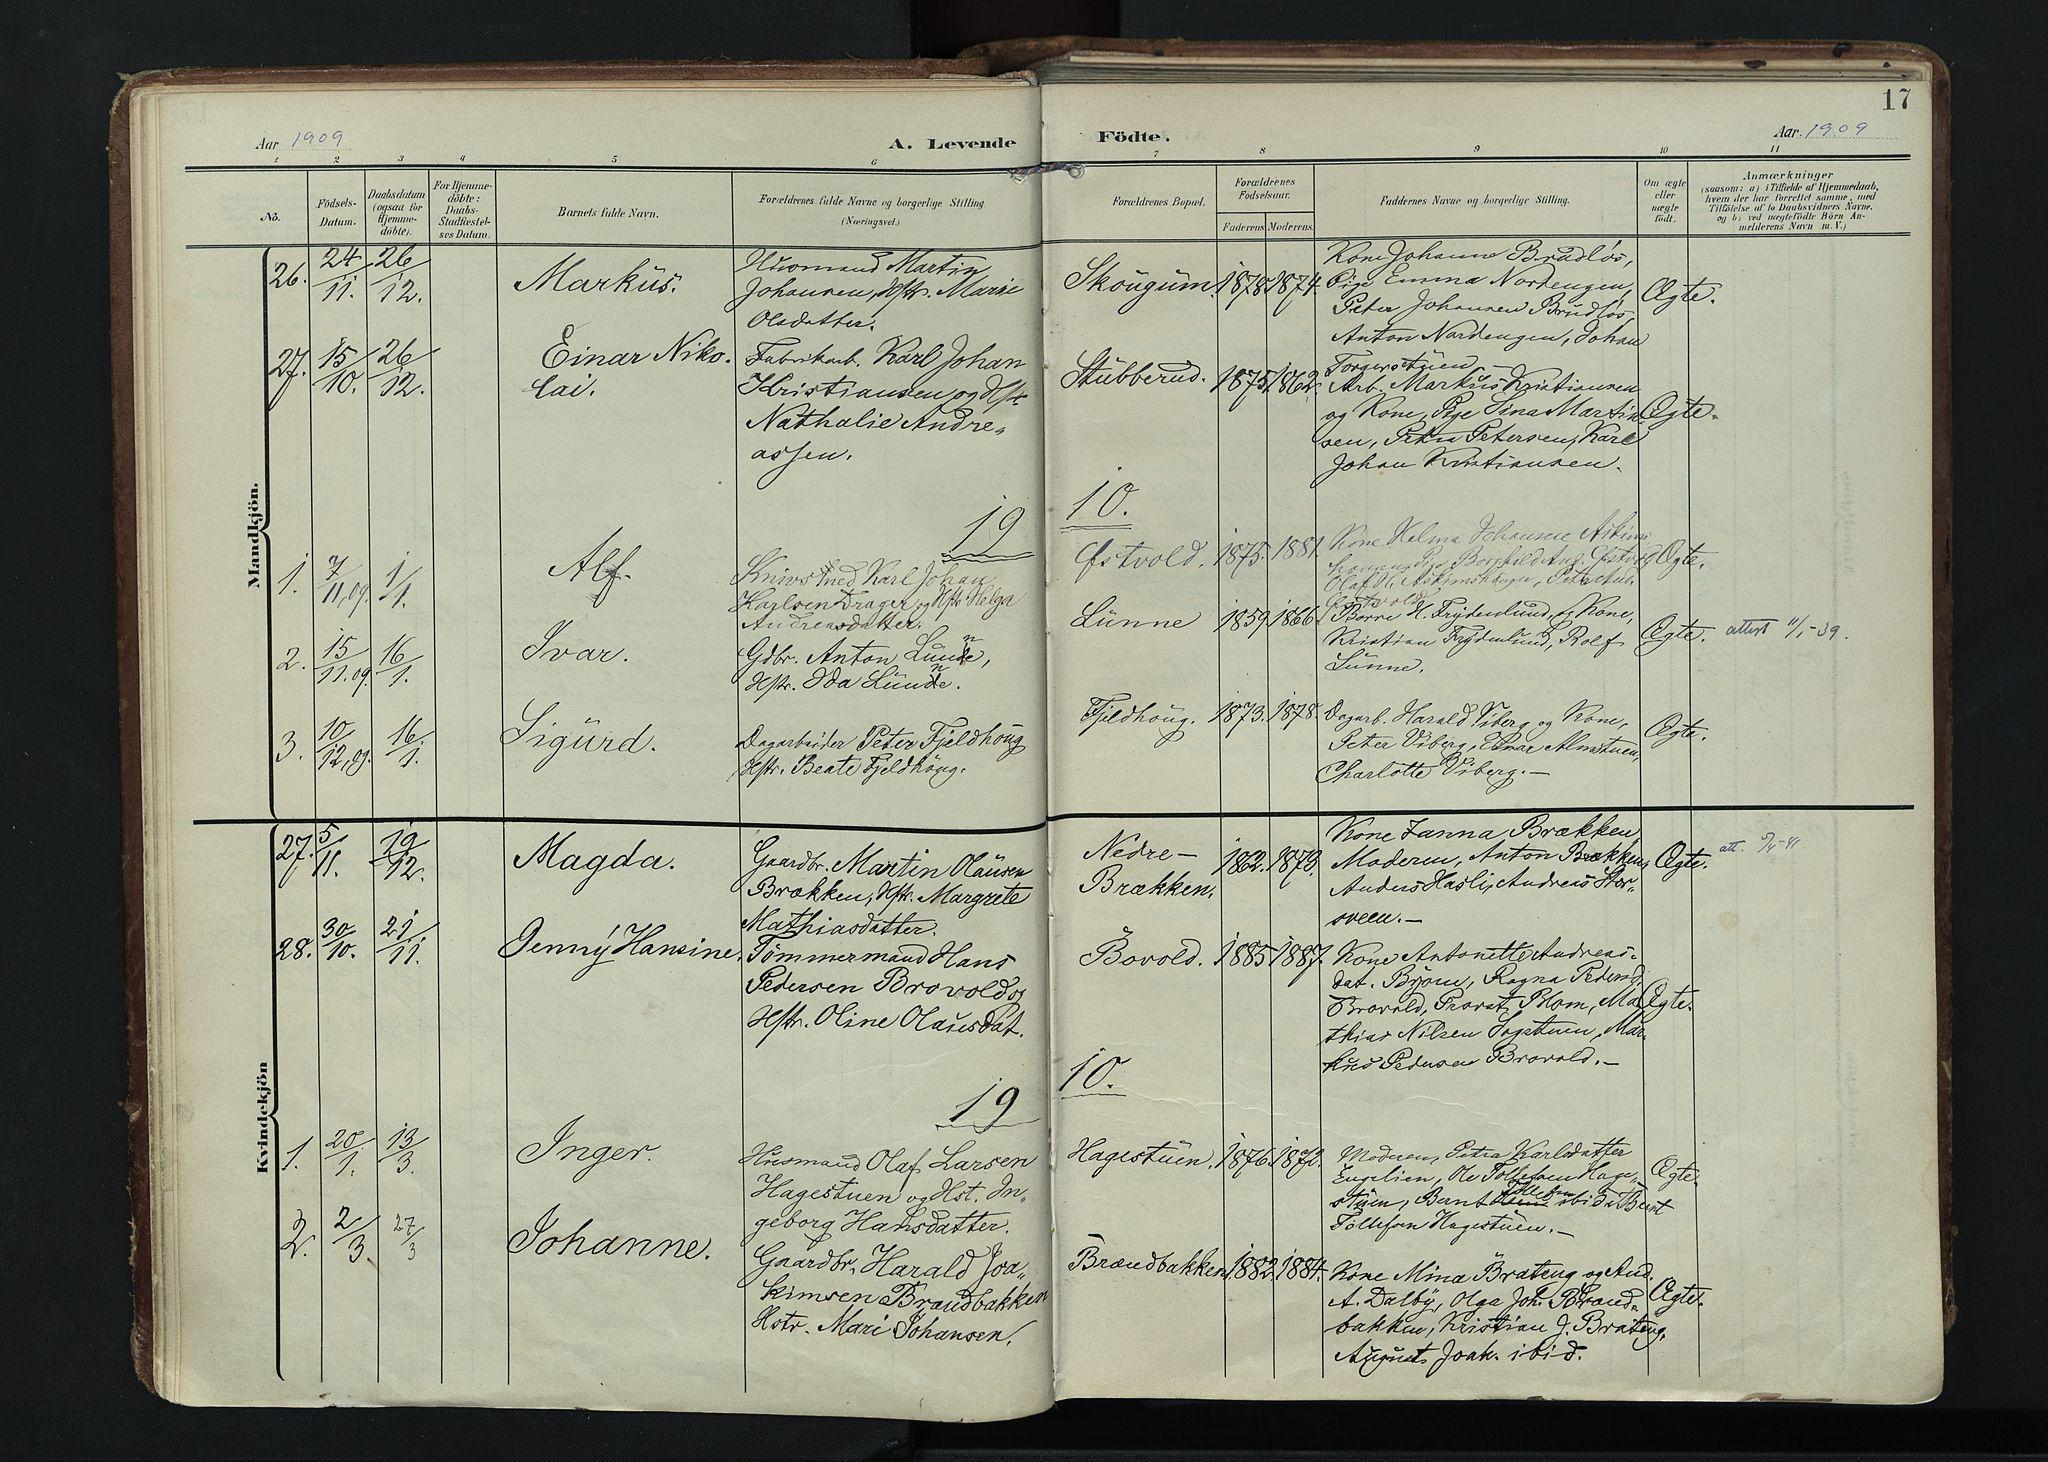 SAH, Vardal prestekontor, H/Ha/Haa/L0020: Ministerialbok nr. 20, 1907-1921, s. 17